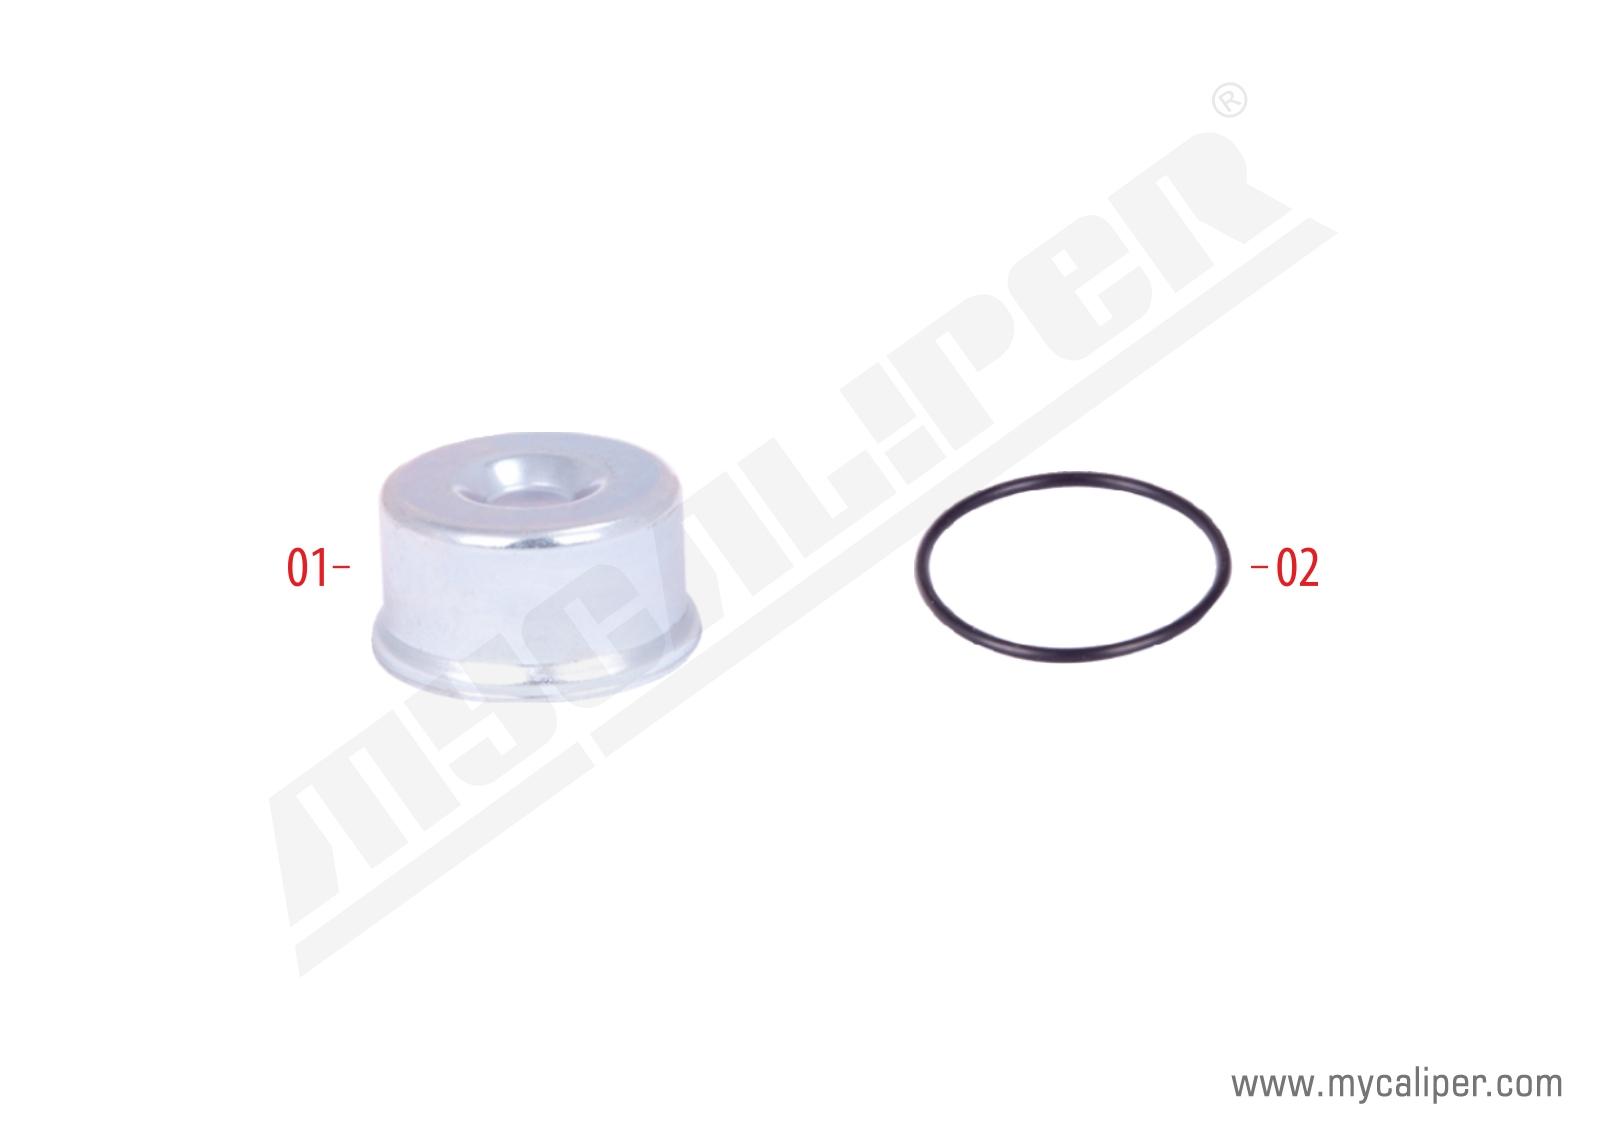 Caliper Steel Cap Repair Kit